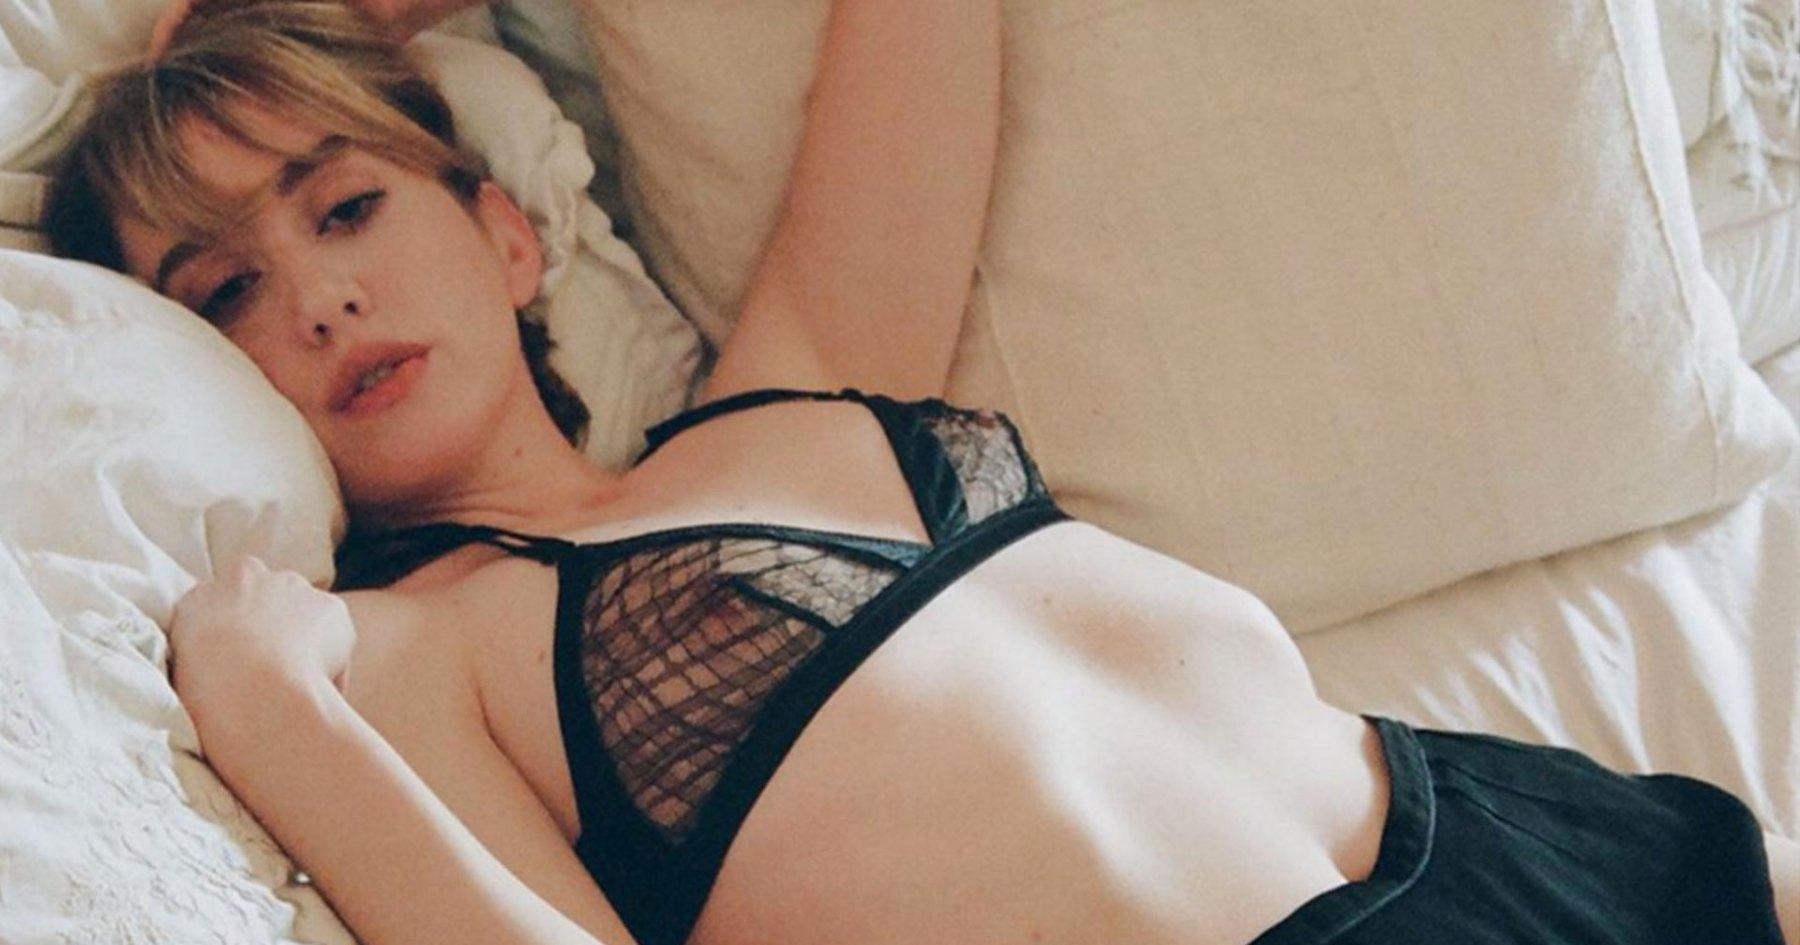 Follow That Girl: Natalie Krim